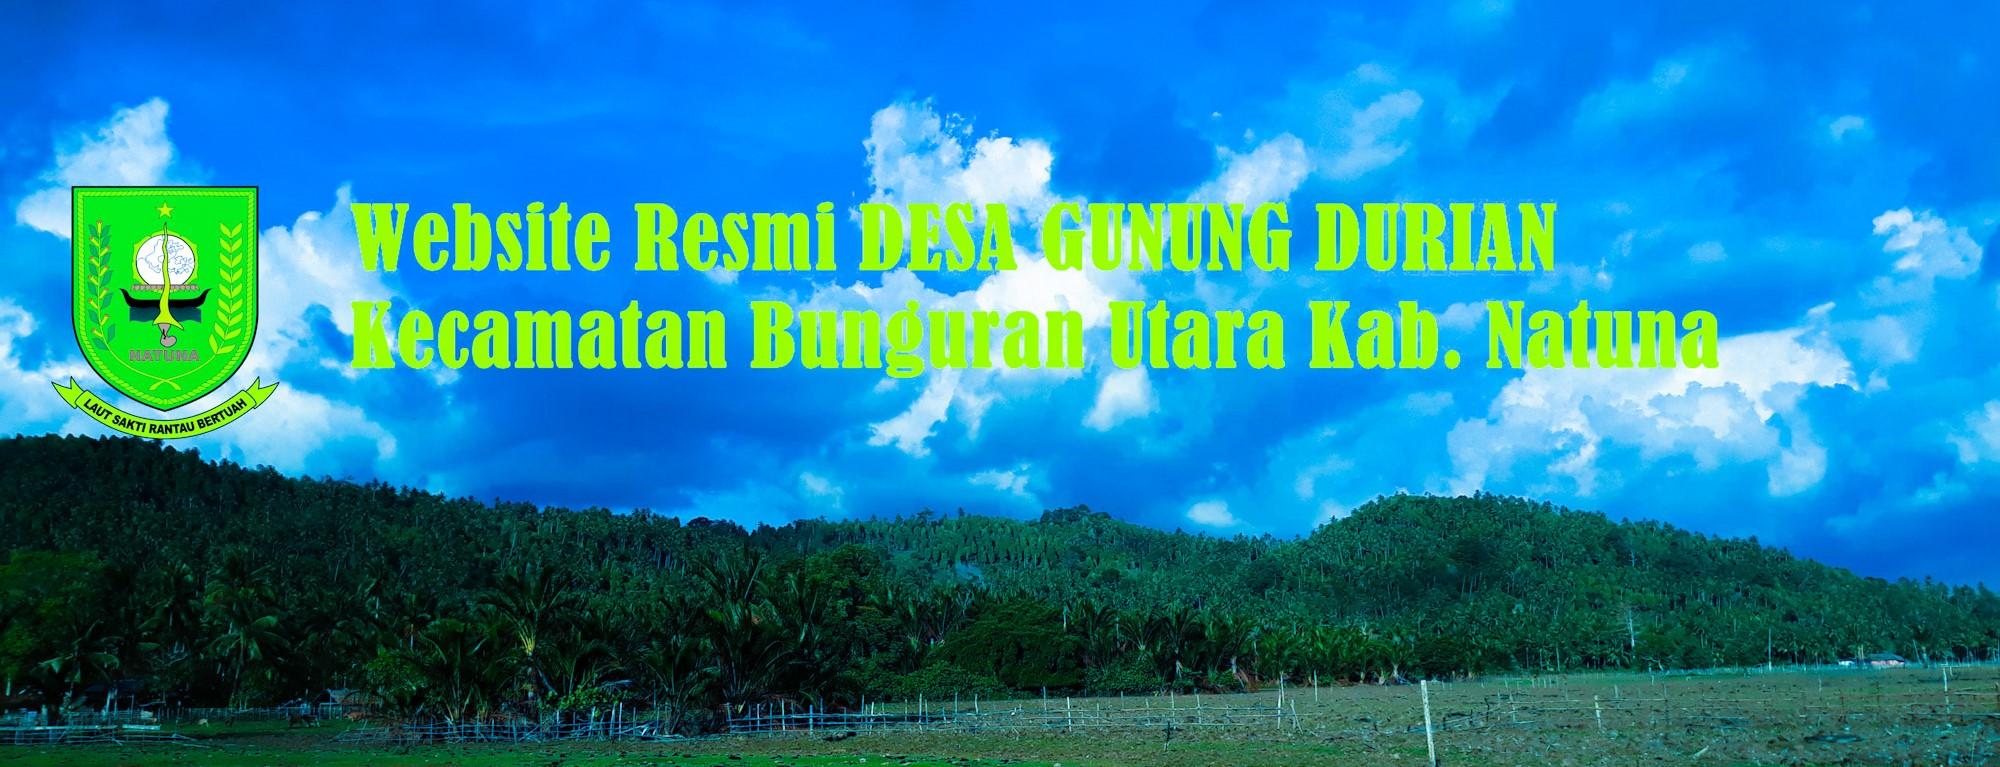 Website Resmi DESA GUNUNG DURIAN - Kab. Natuna